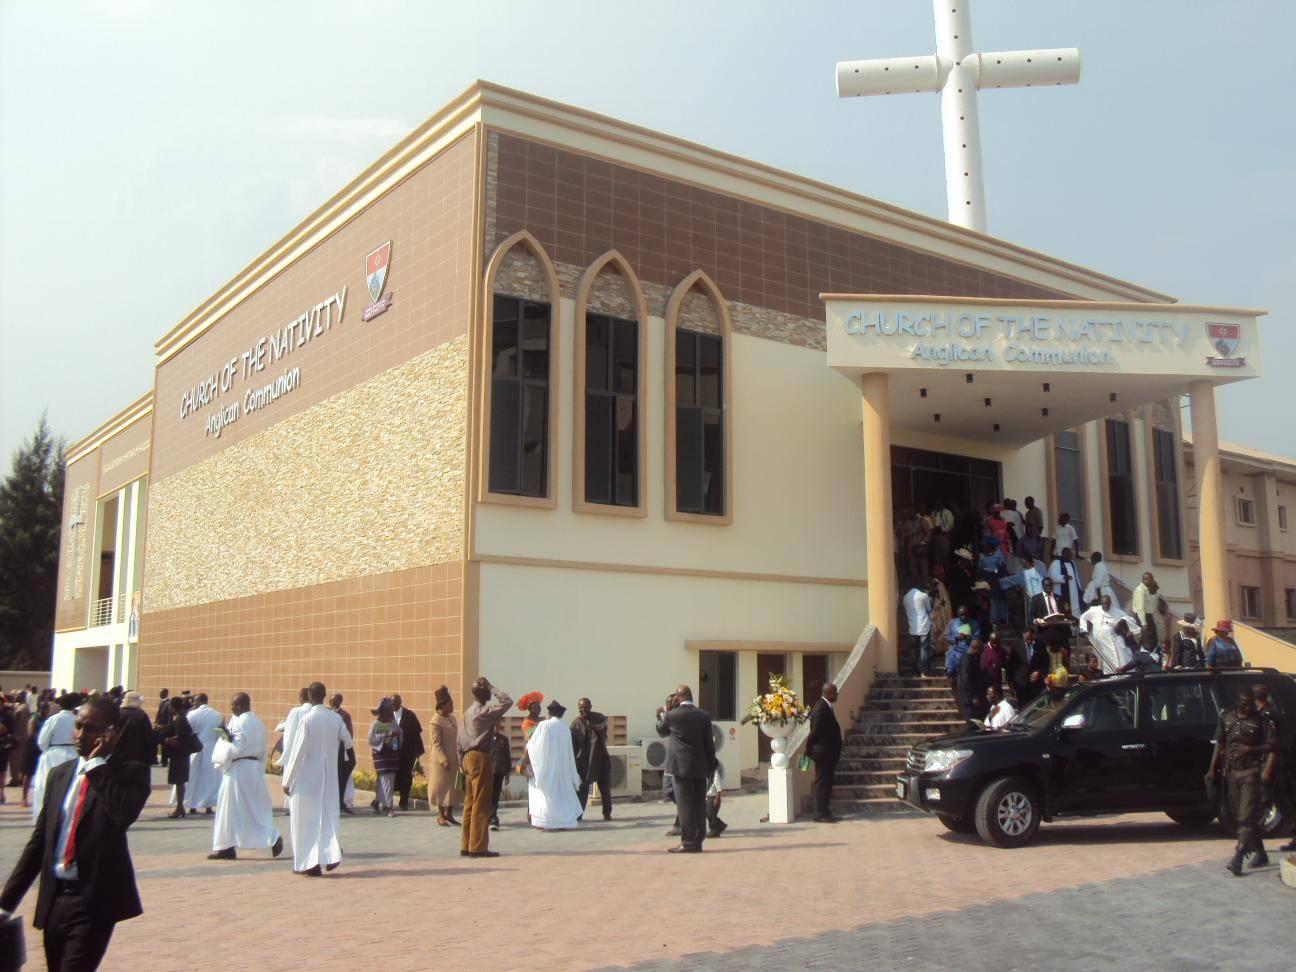 Church of the Nativity, Ikoyi